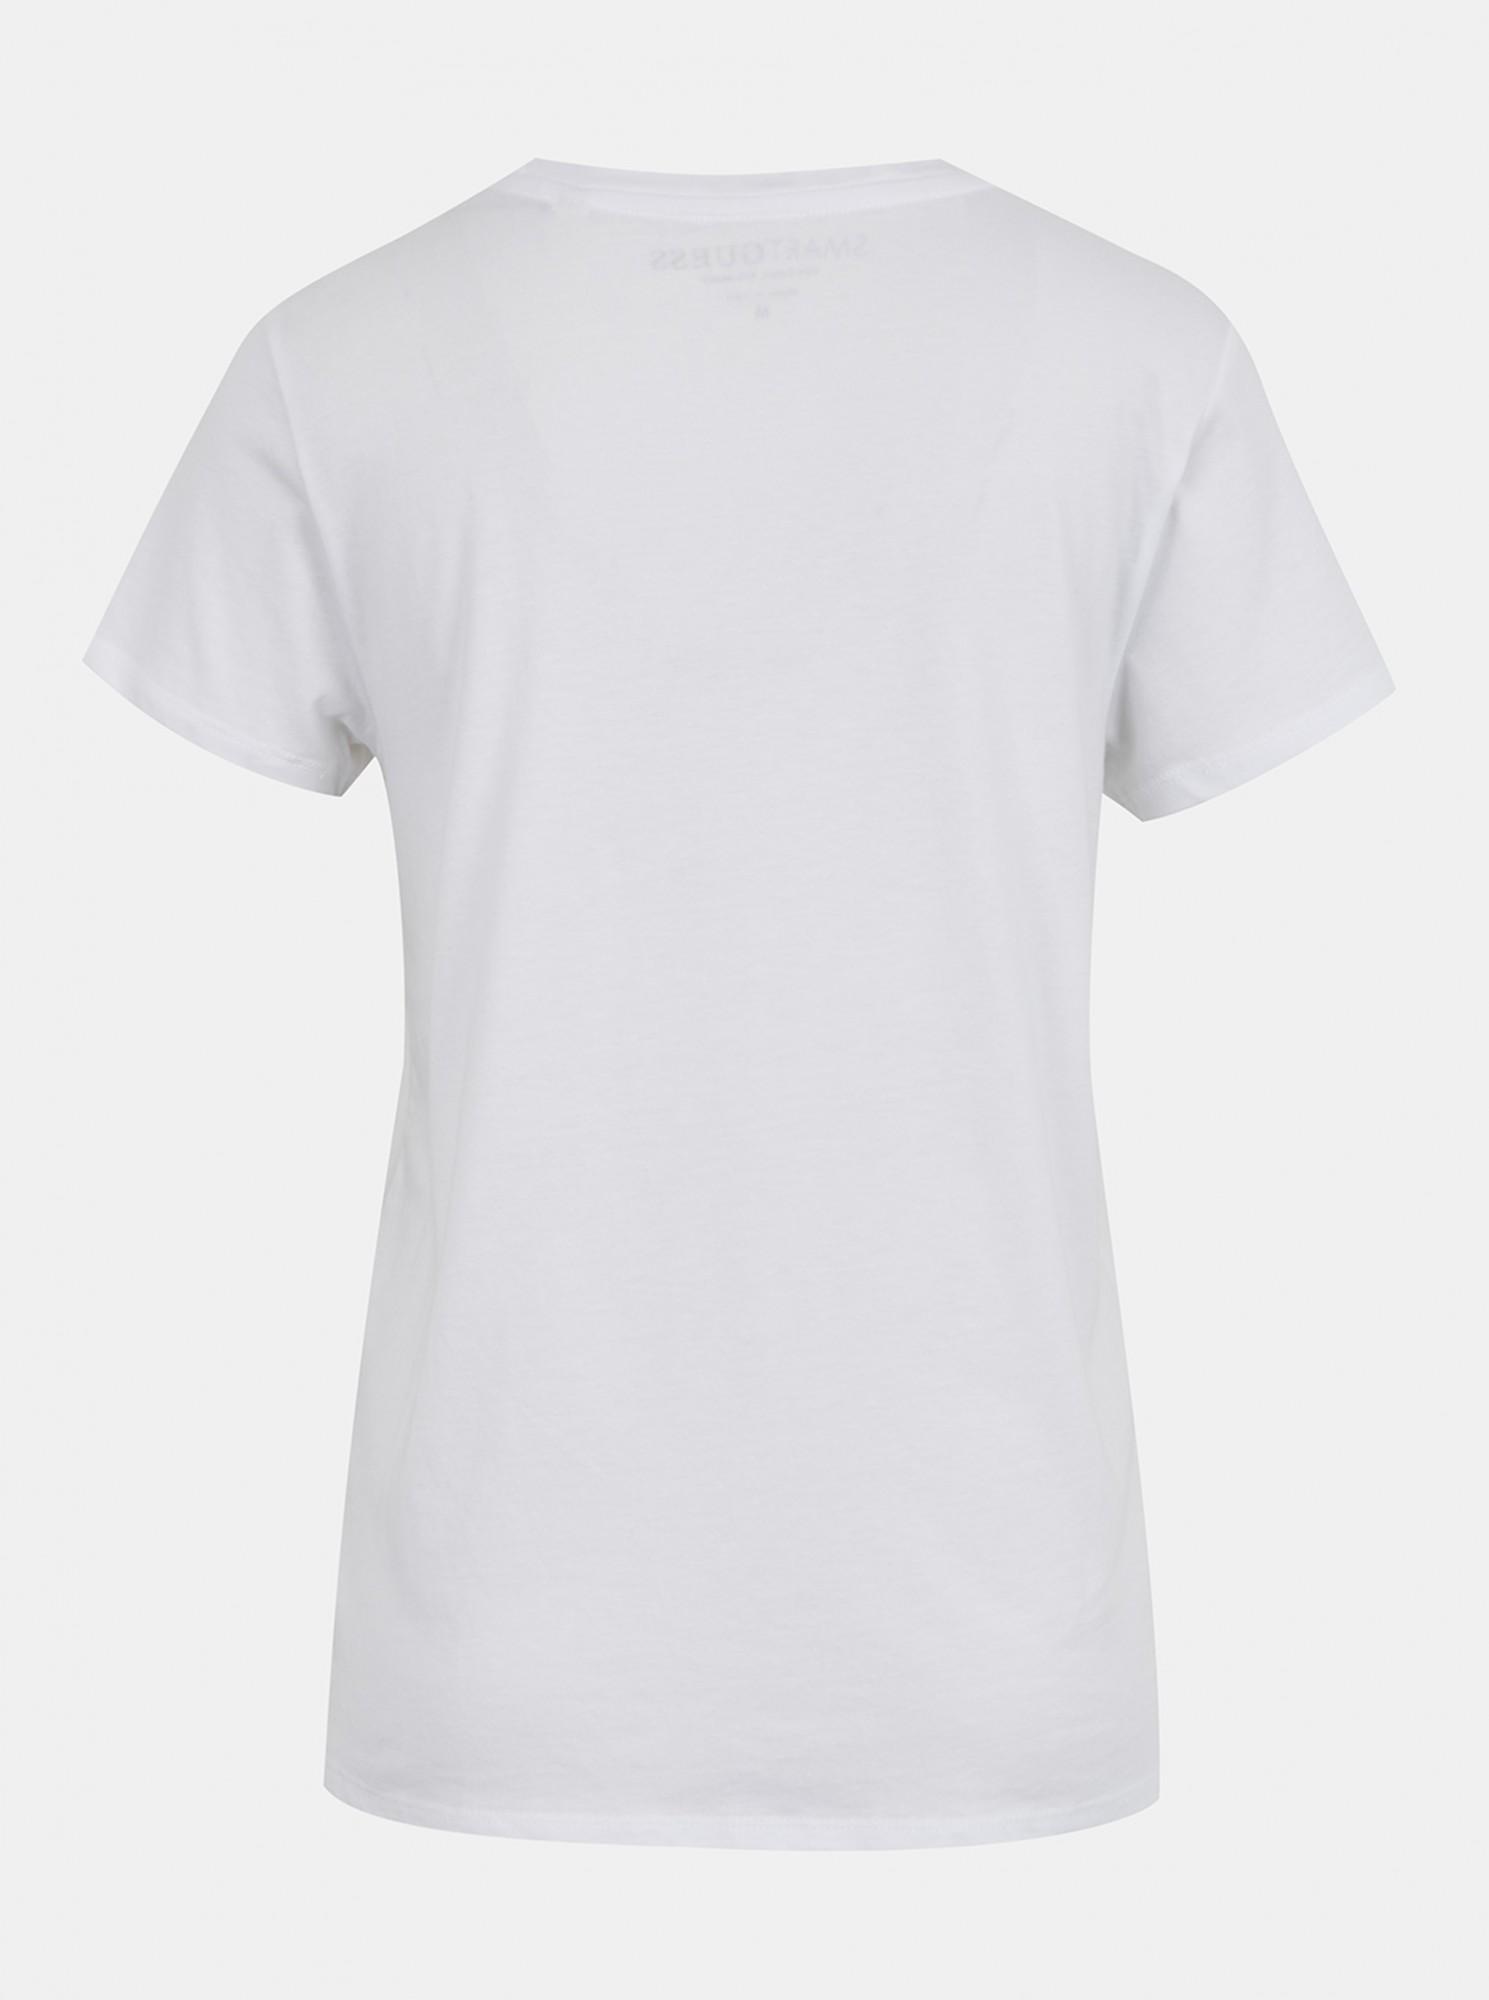 Guess biały koszulka Odette Tee z nadrukiem